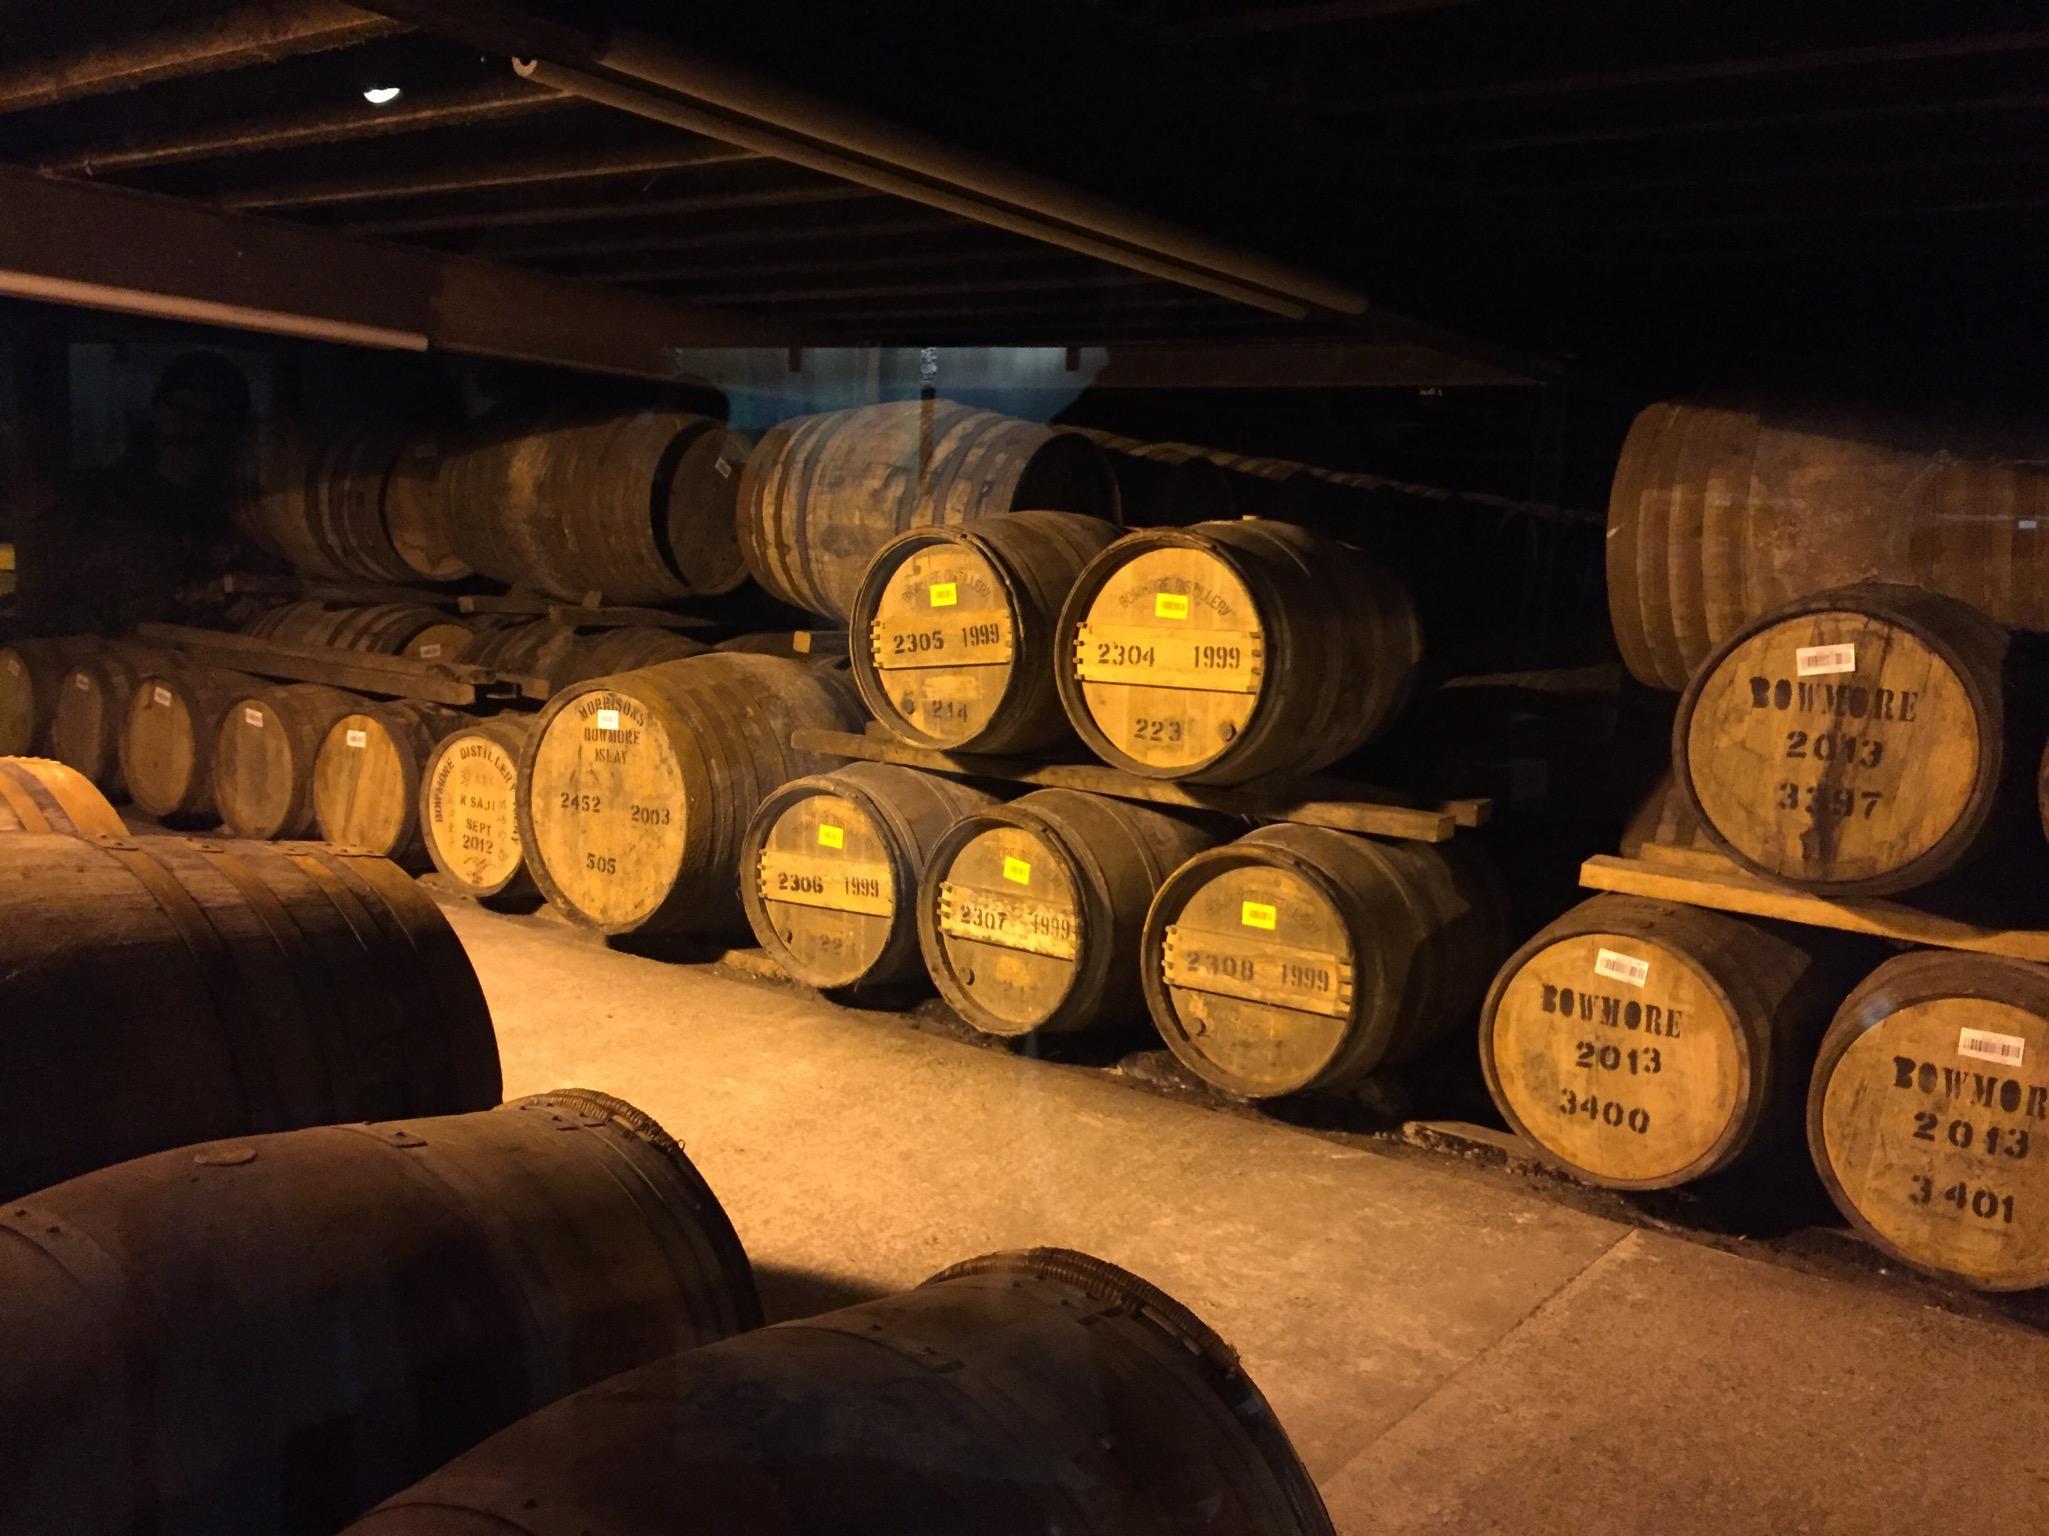 Barrels of Bowmore Scotch